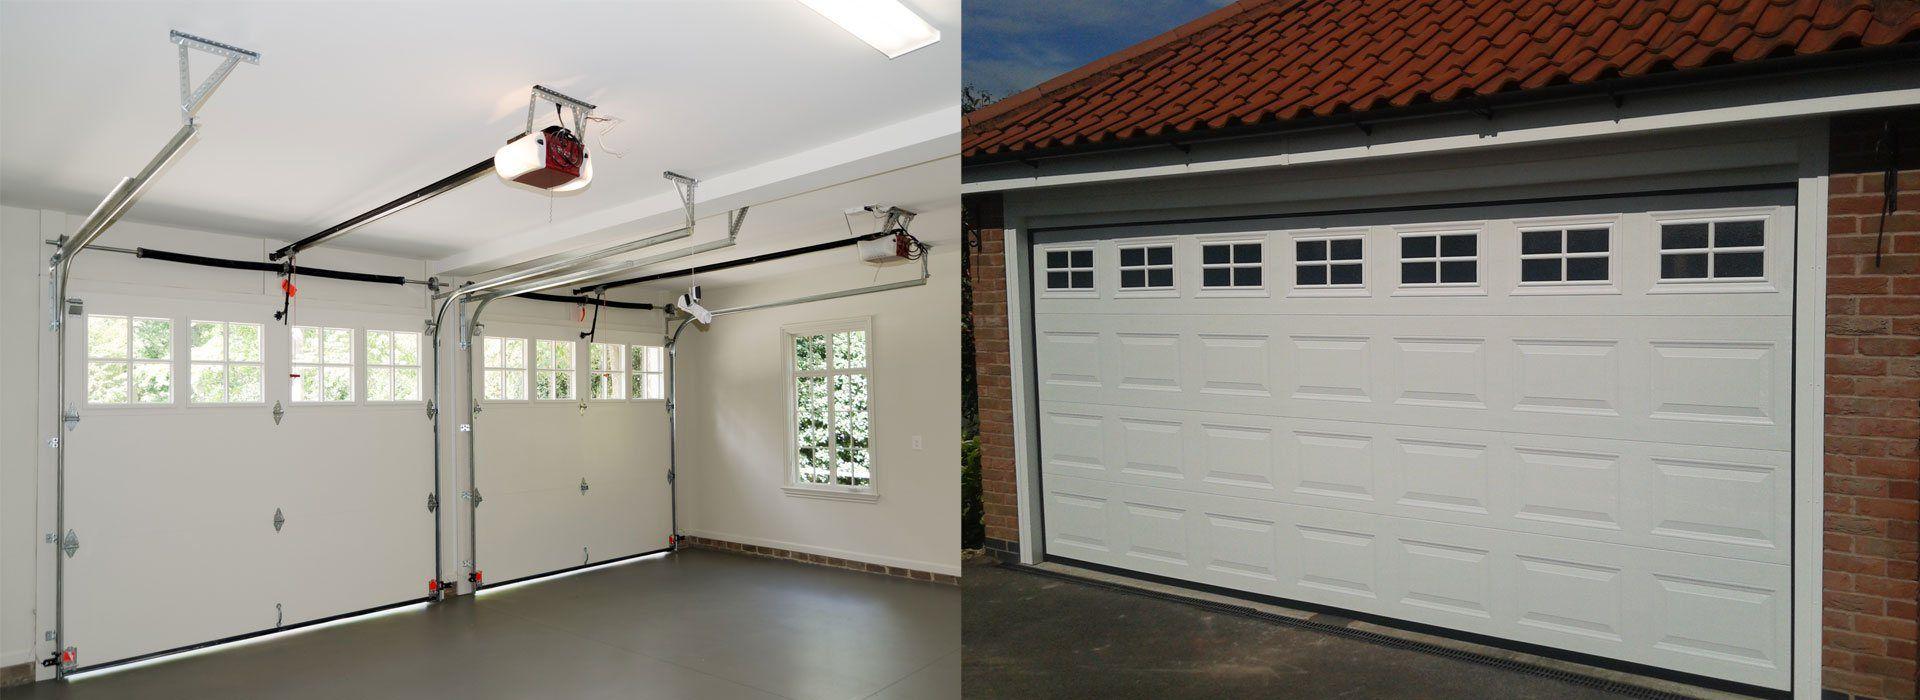 Garage Doors Dubai Twindoor Dubai Bernal 0506774412 Garage Doors Affordable Garage Doors Garage Door Opener Repair